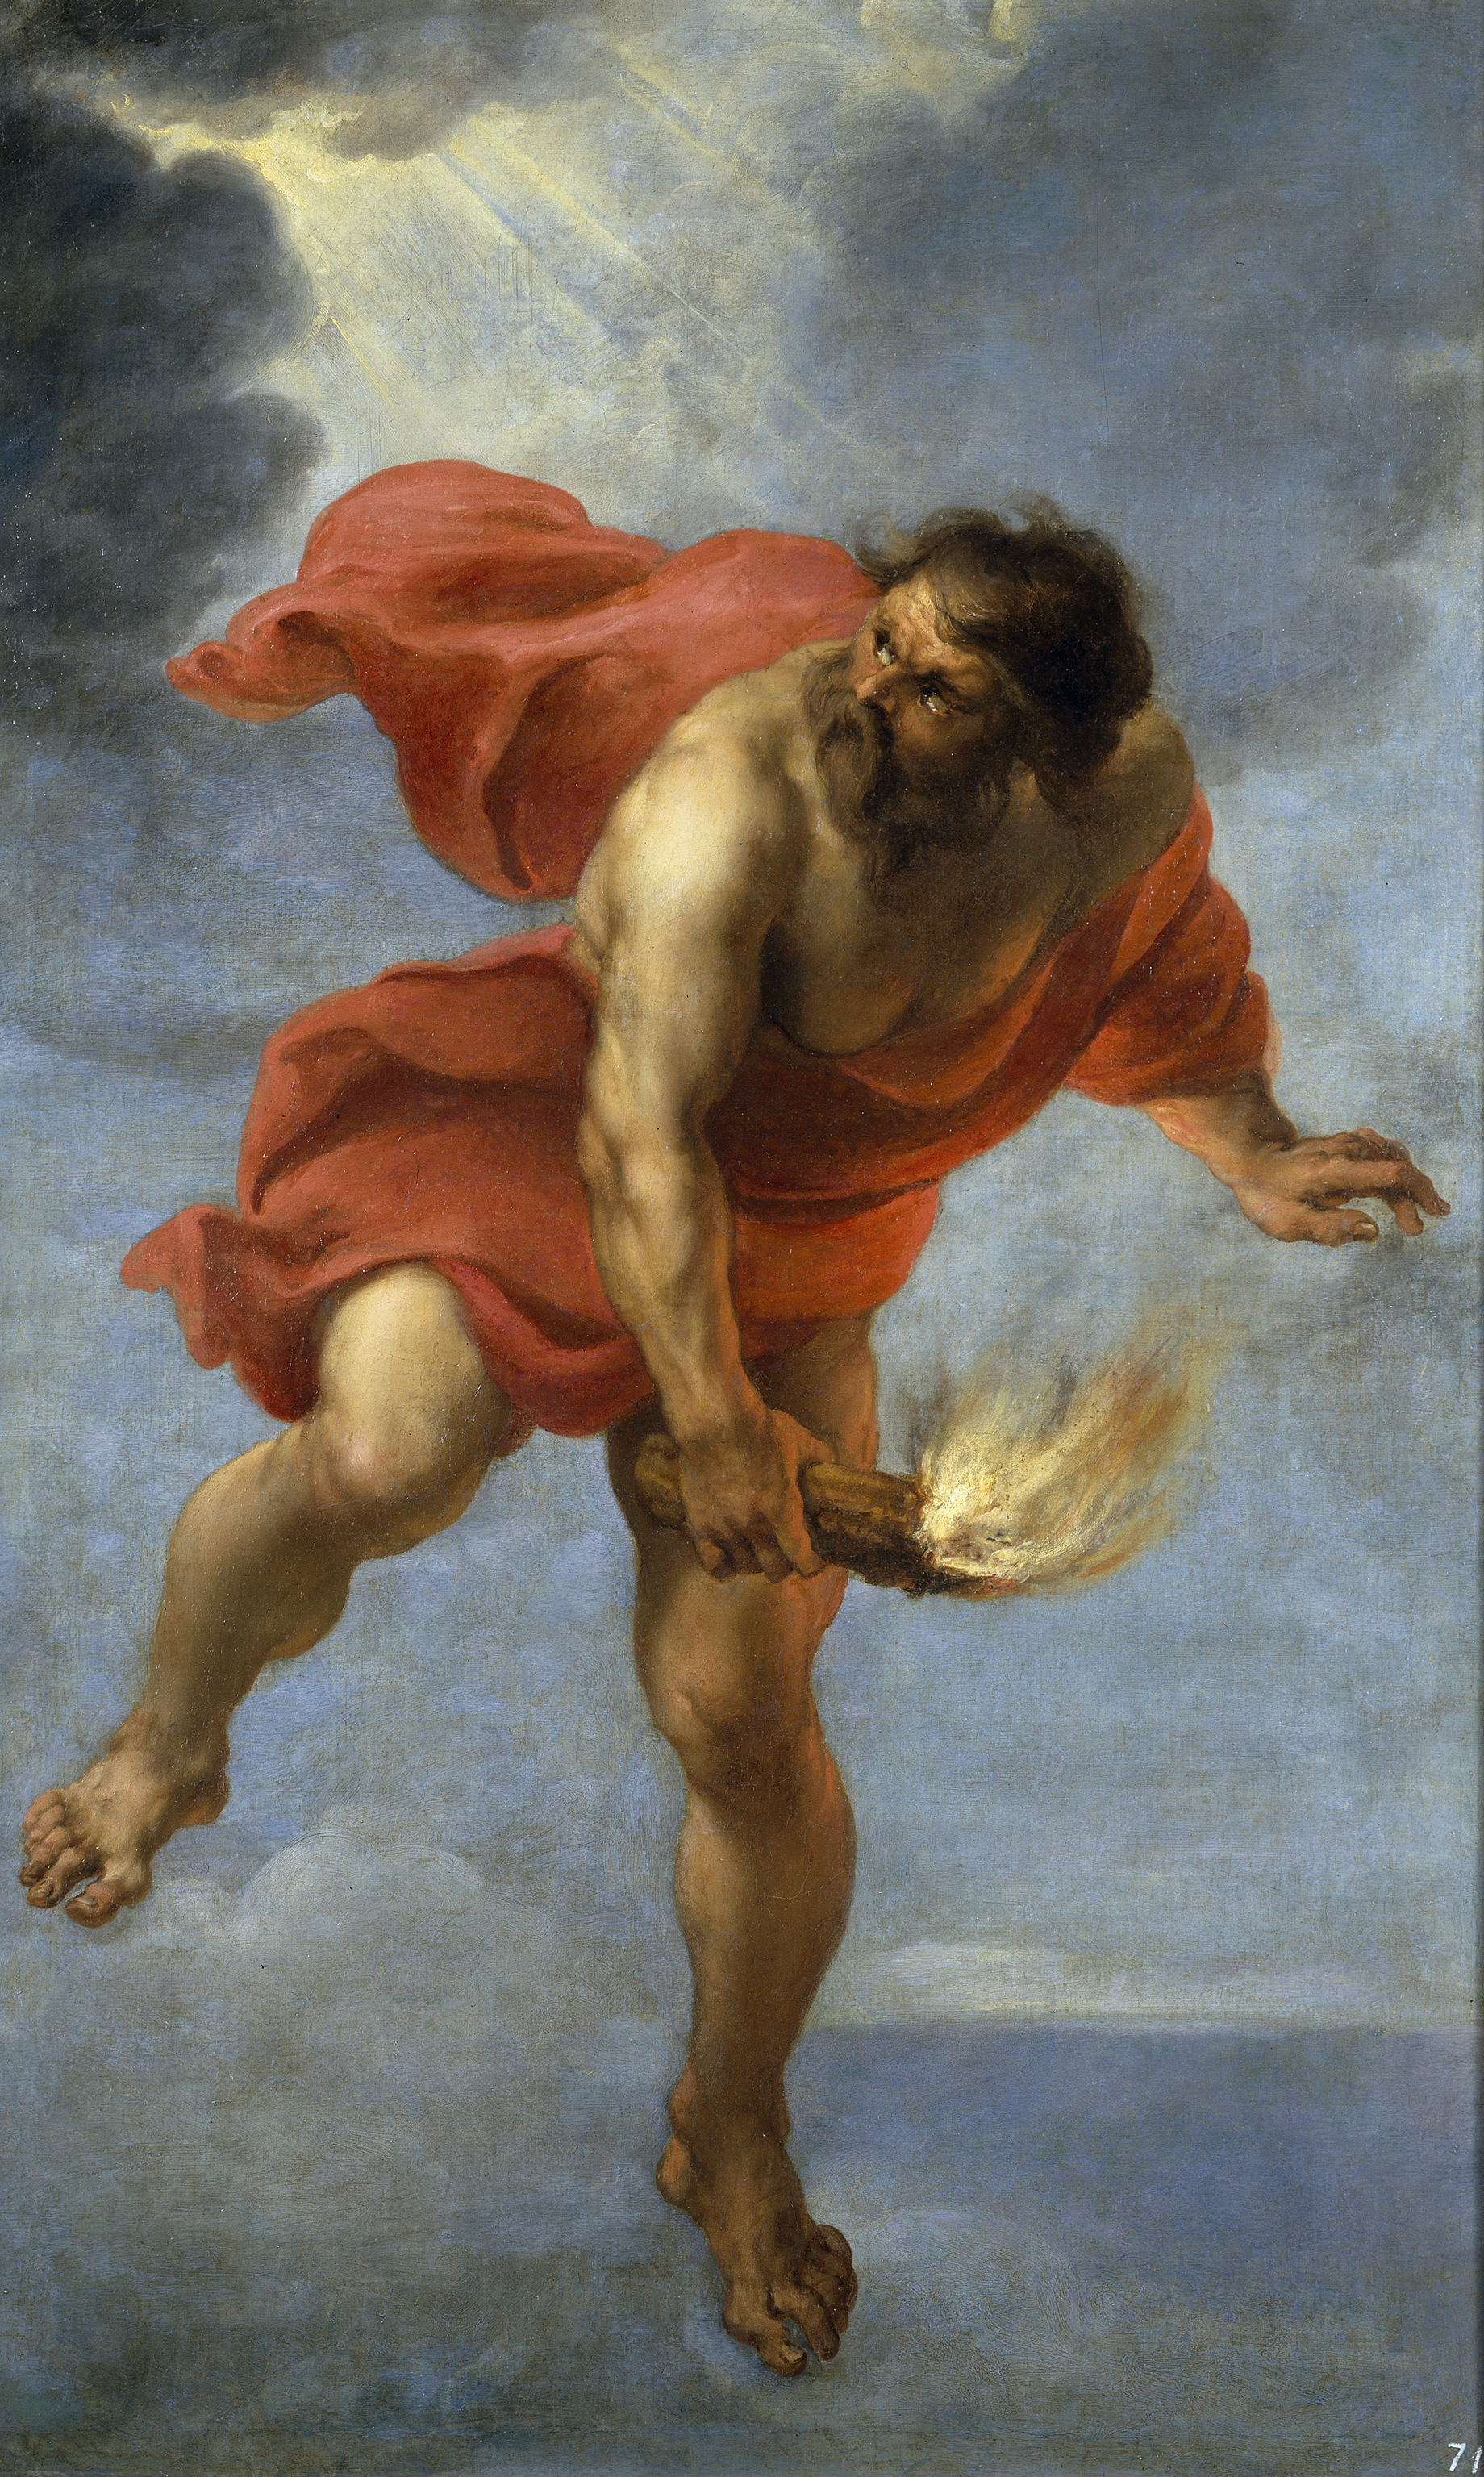 The Titan Prometheus in Greek Mythology